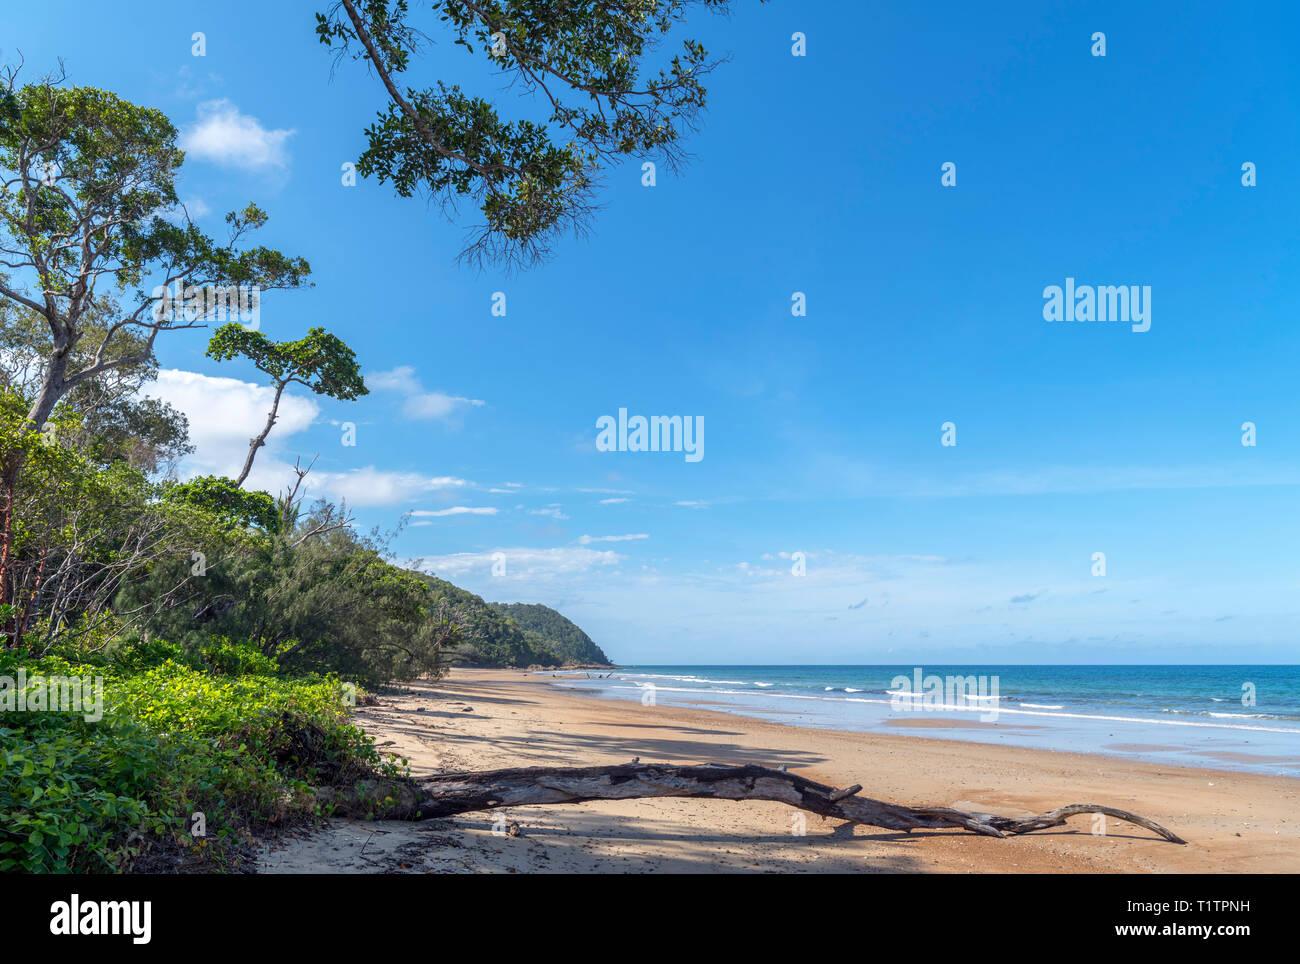 Daintree, Queensland. Beach at Cow Bay, Daintree Rainforest, Daintree National Park, Far North Queensland, Australia - Stock Image